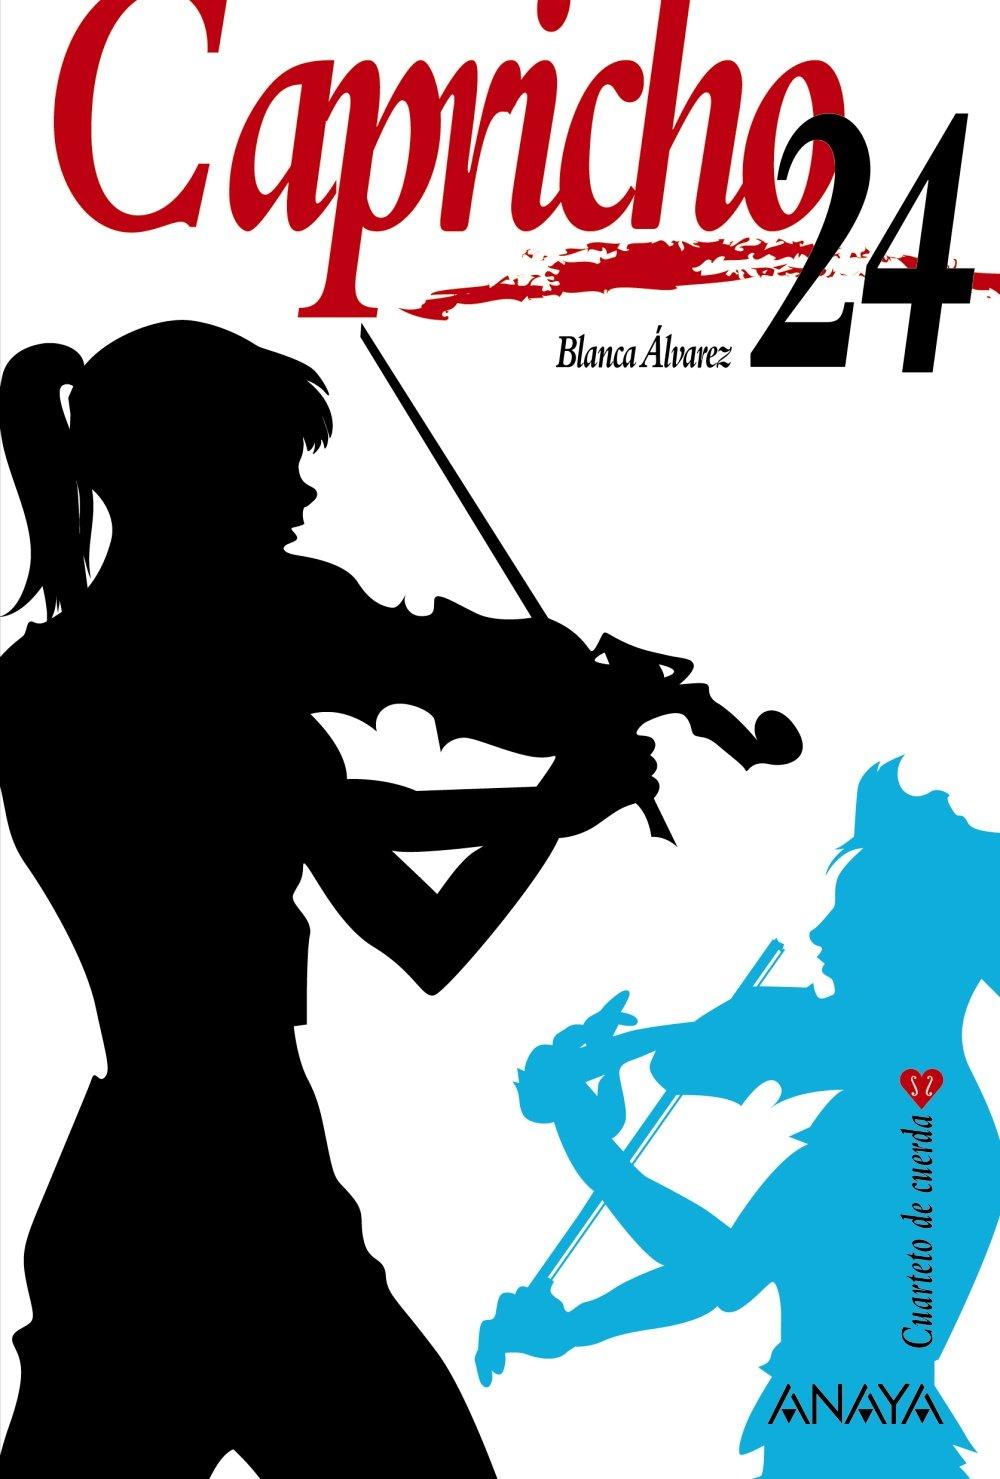 Download Capricho 24 / Caprice 24 (Cuarteto de cuerda / String Quartet) (Spanish Edition) ebook